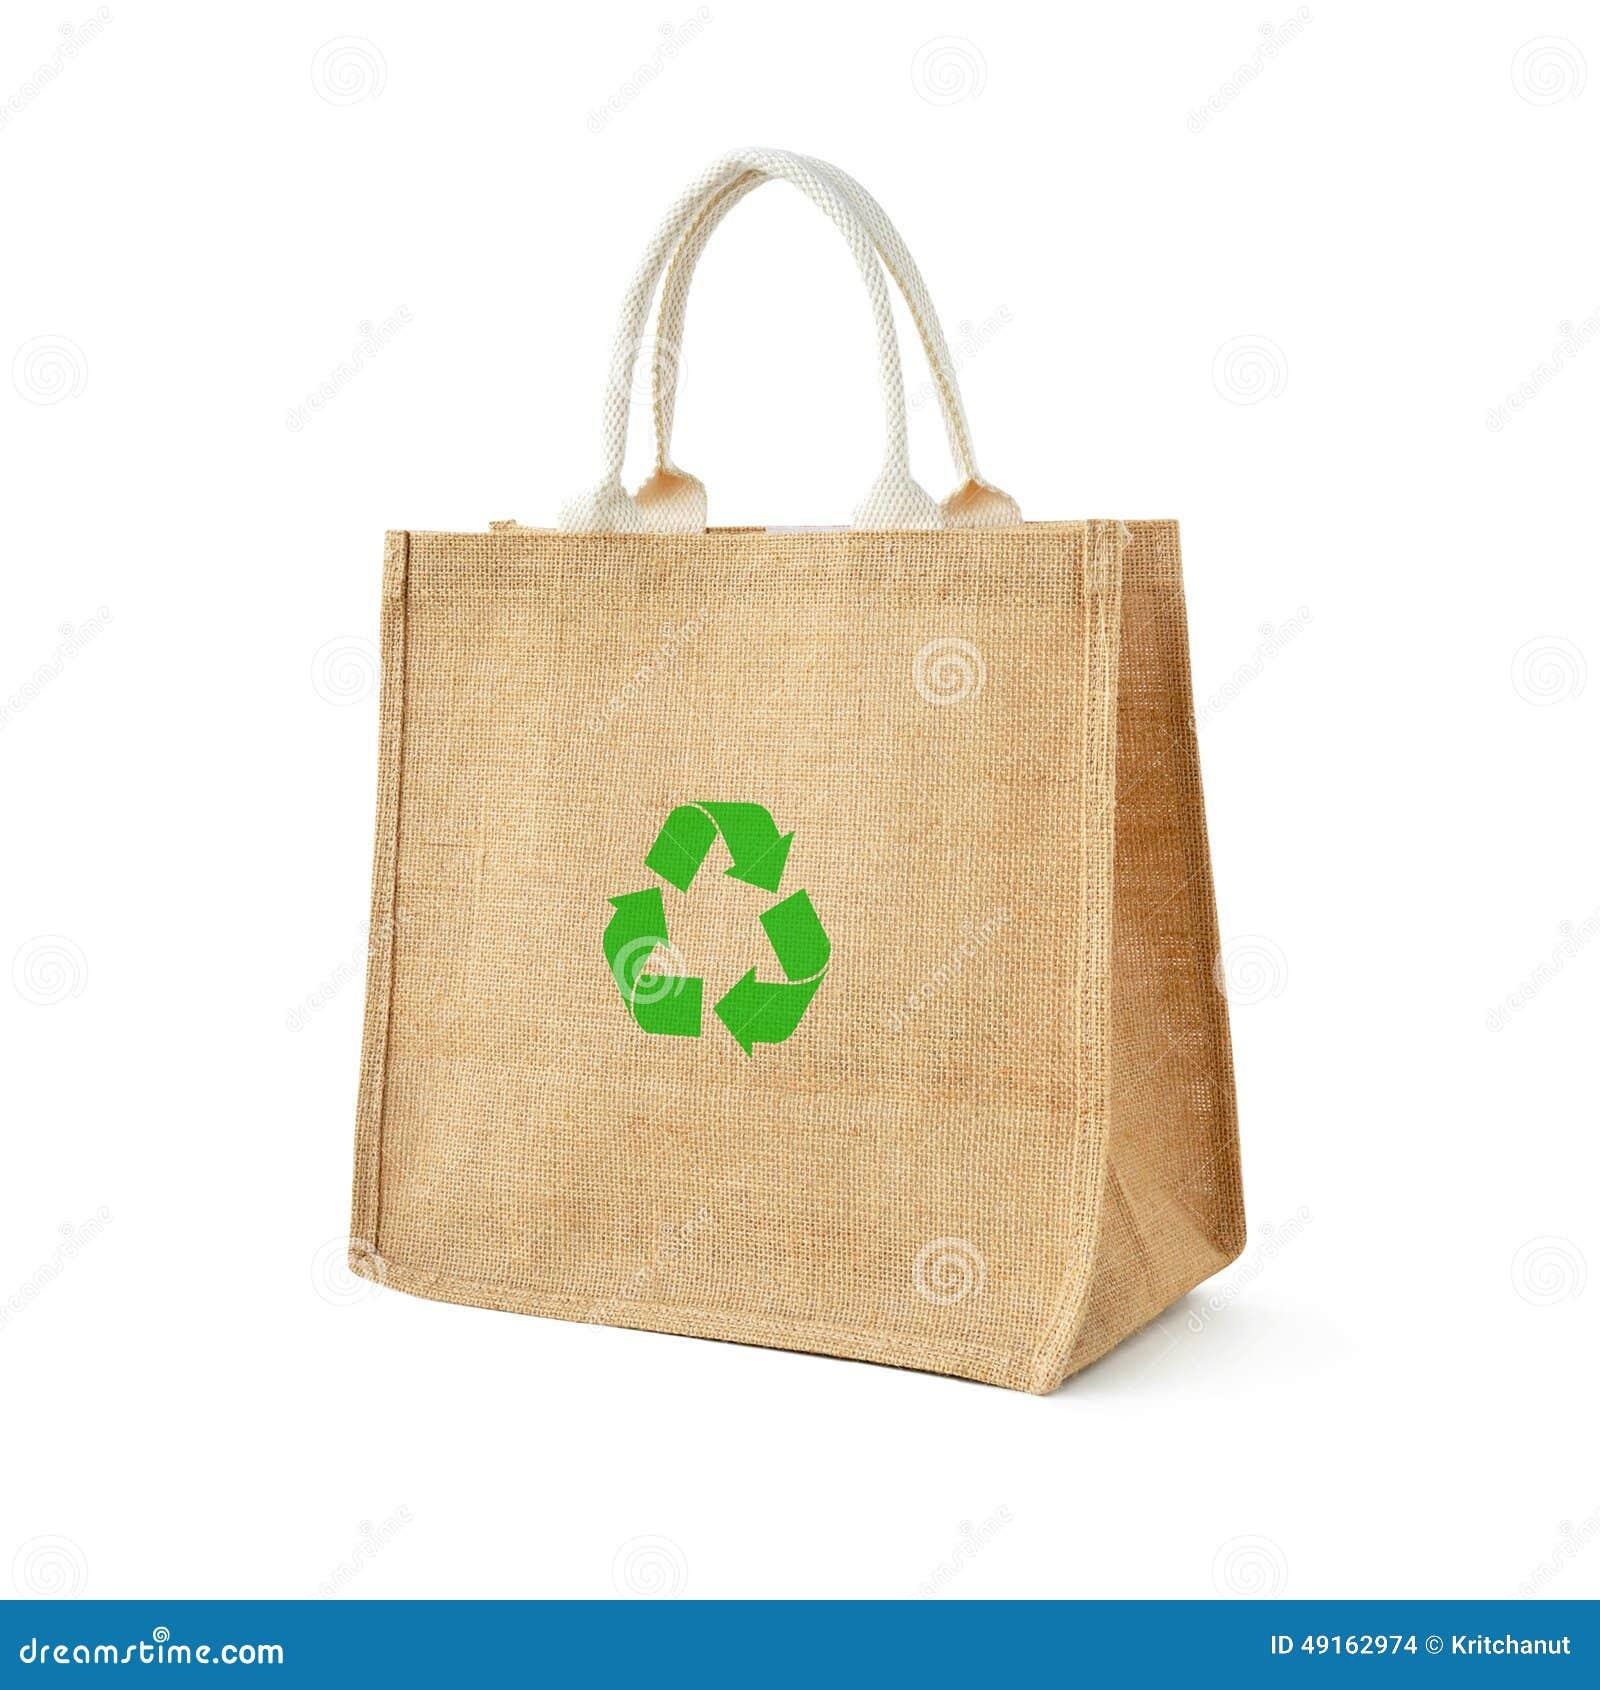 Jute Bags Manufacturing Business Plan – Profitable?